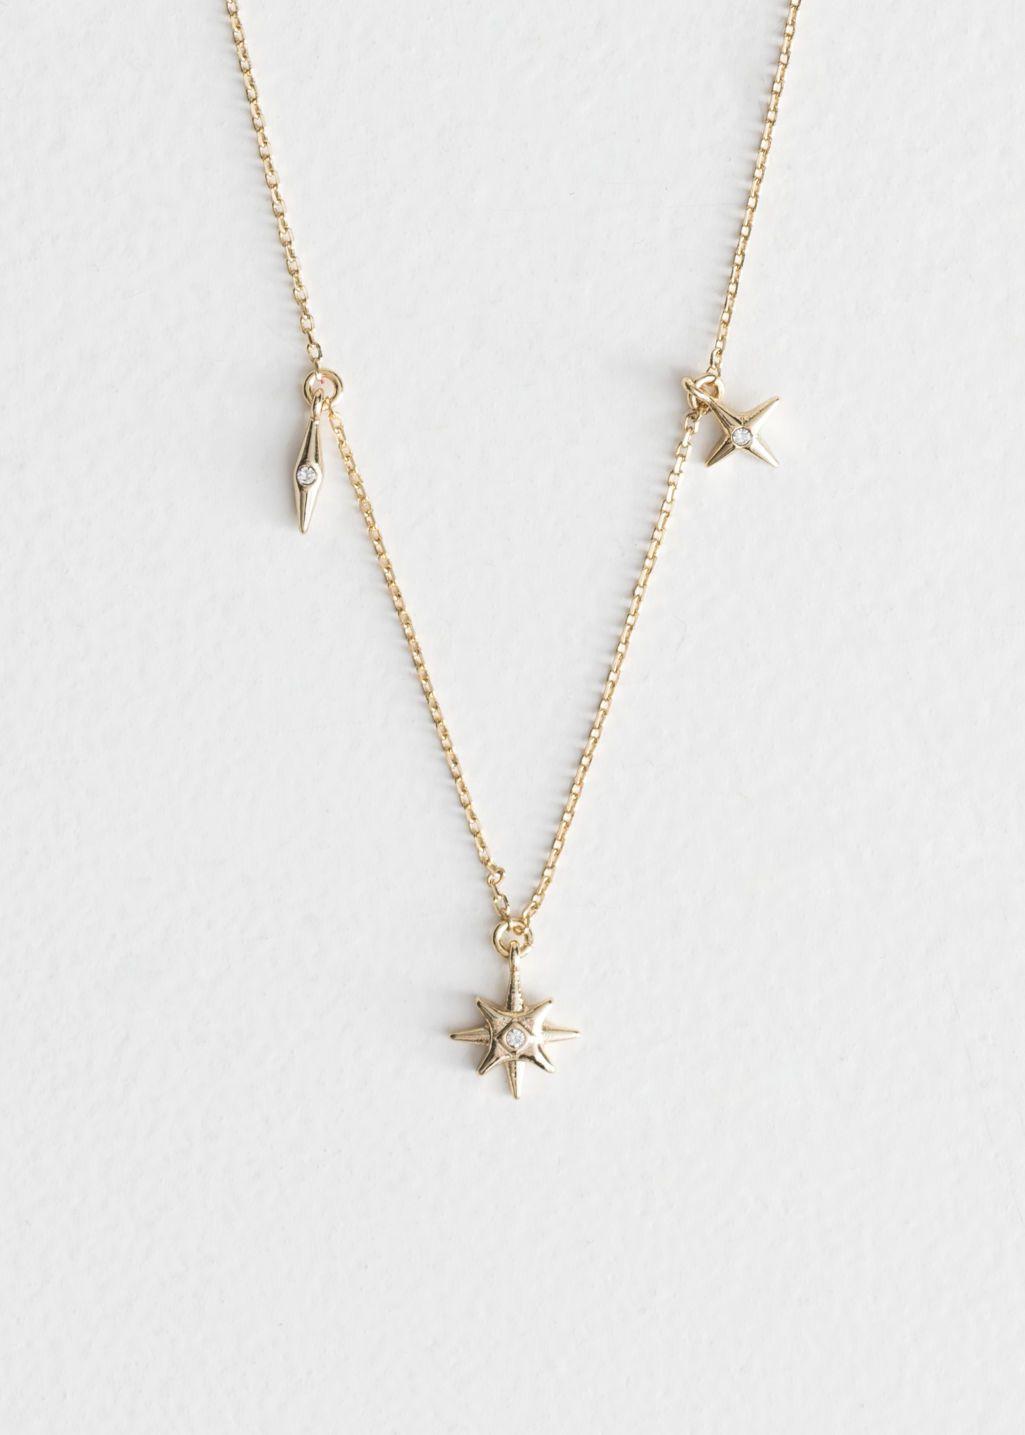 Women Girls Cat And Moon Gold Silver Necklace Chain Choker Jewellery Pendant UK